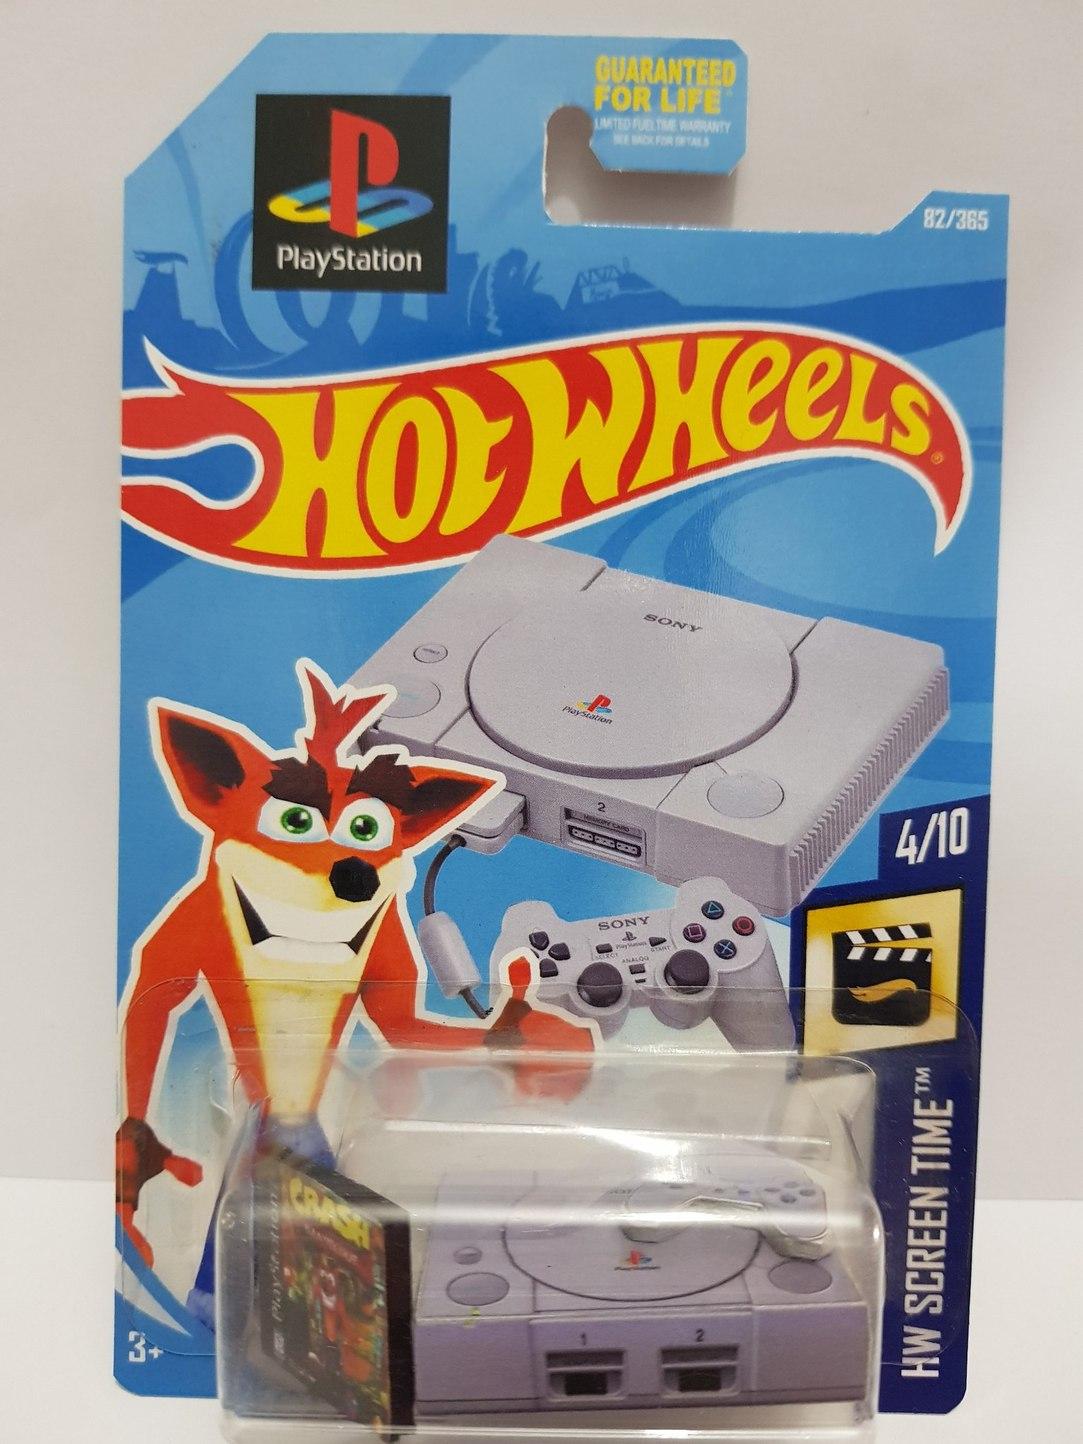 PlayStation hotwheels - meme